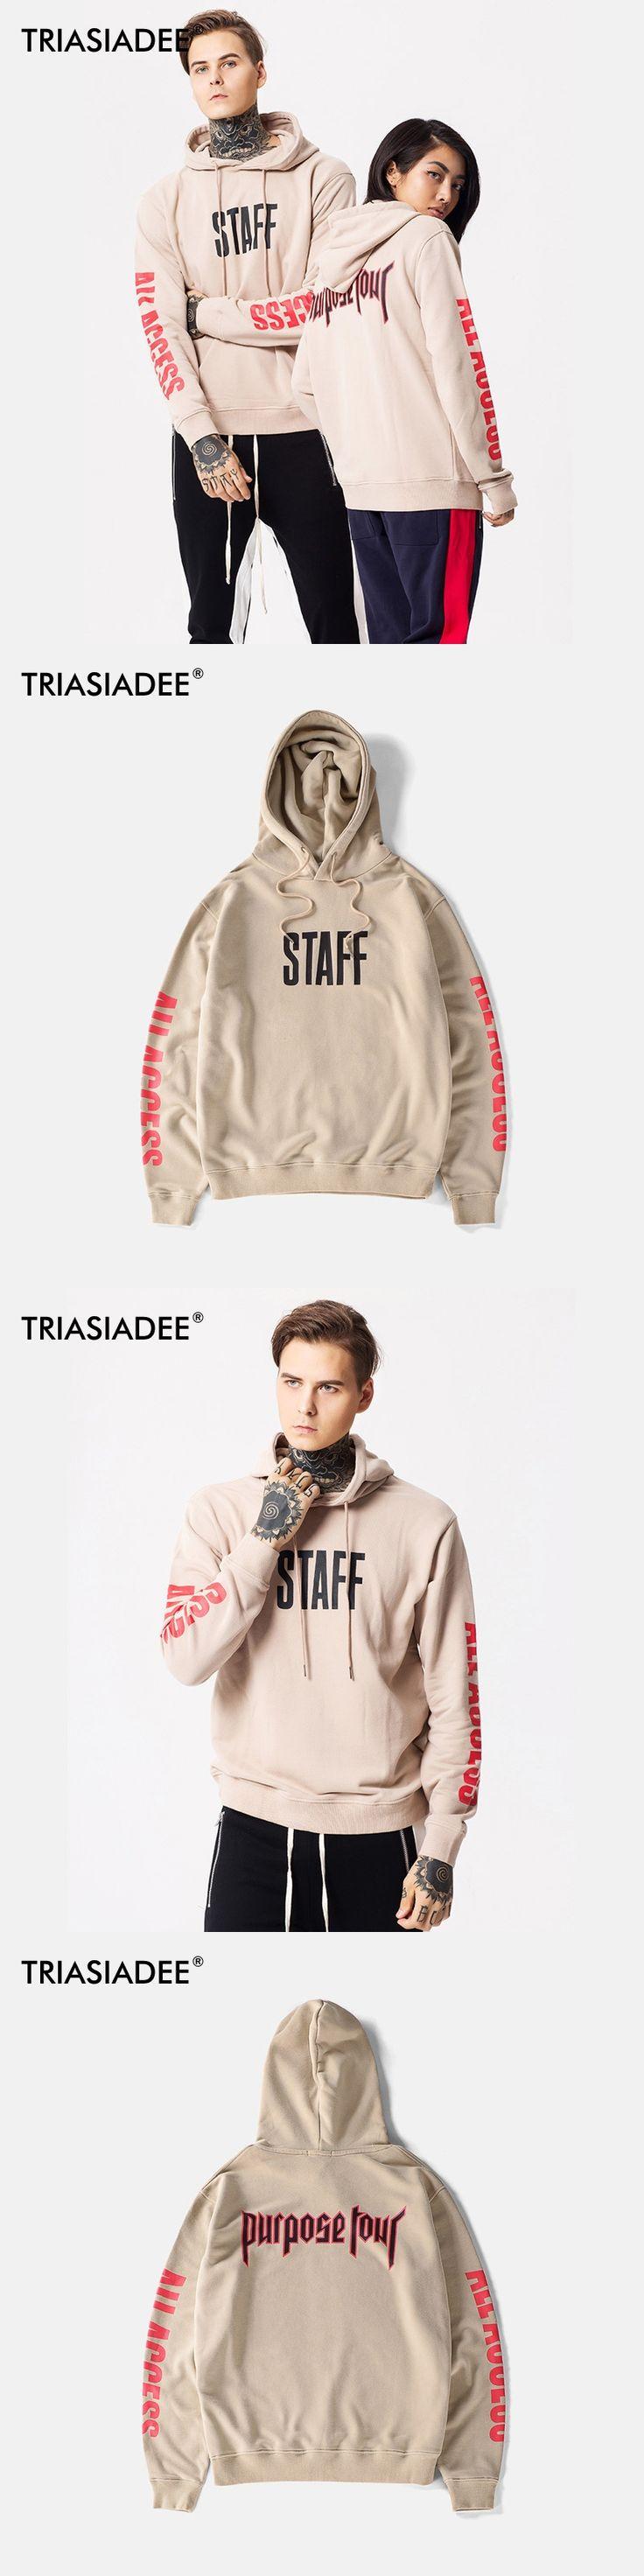 TRIASIADEE Mens Justin Bieber Purpose Tour Hoodie Winter Moletom  Sweatshirt